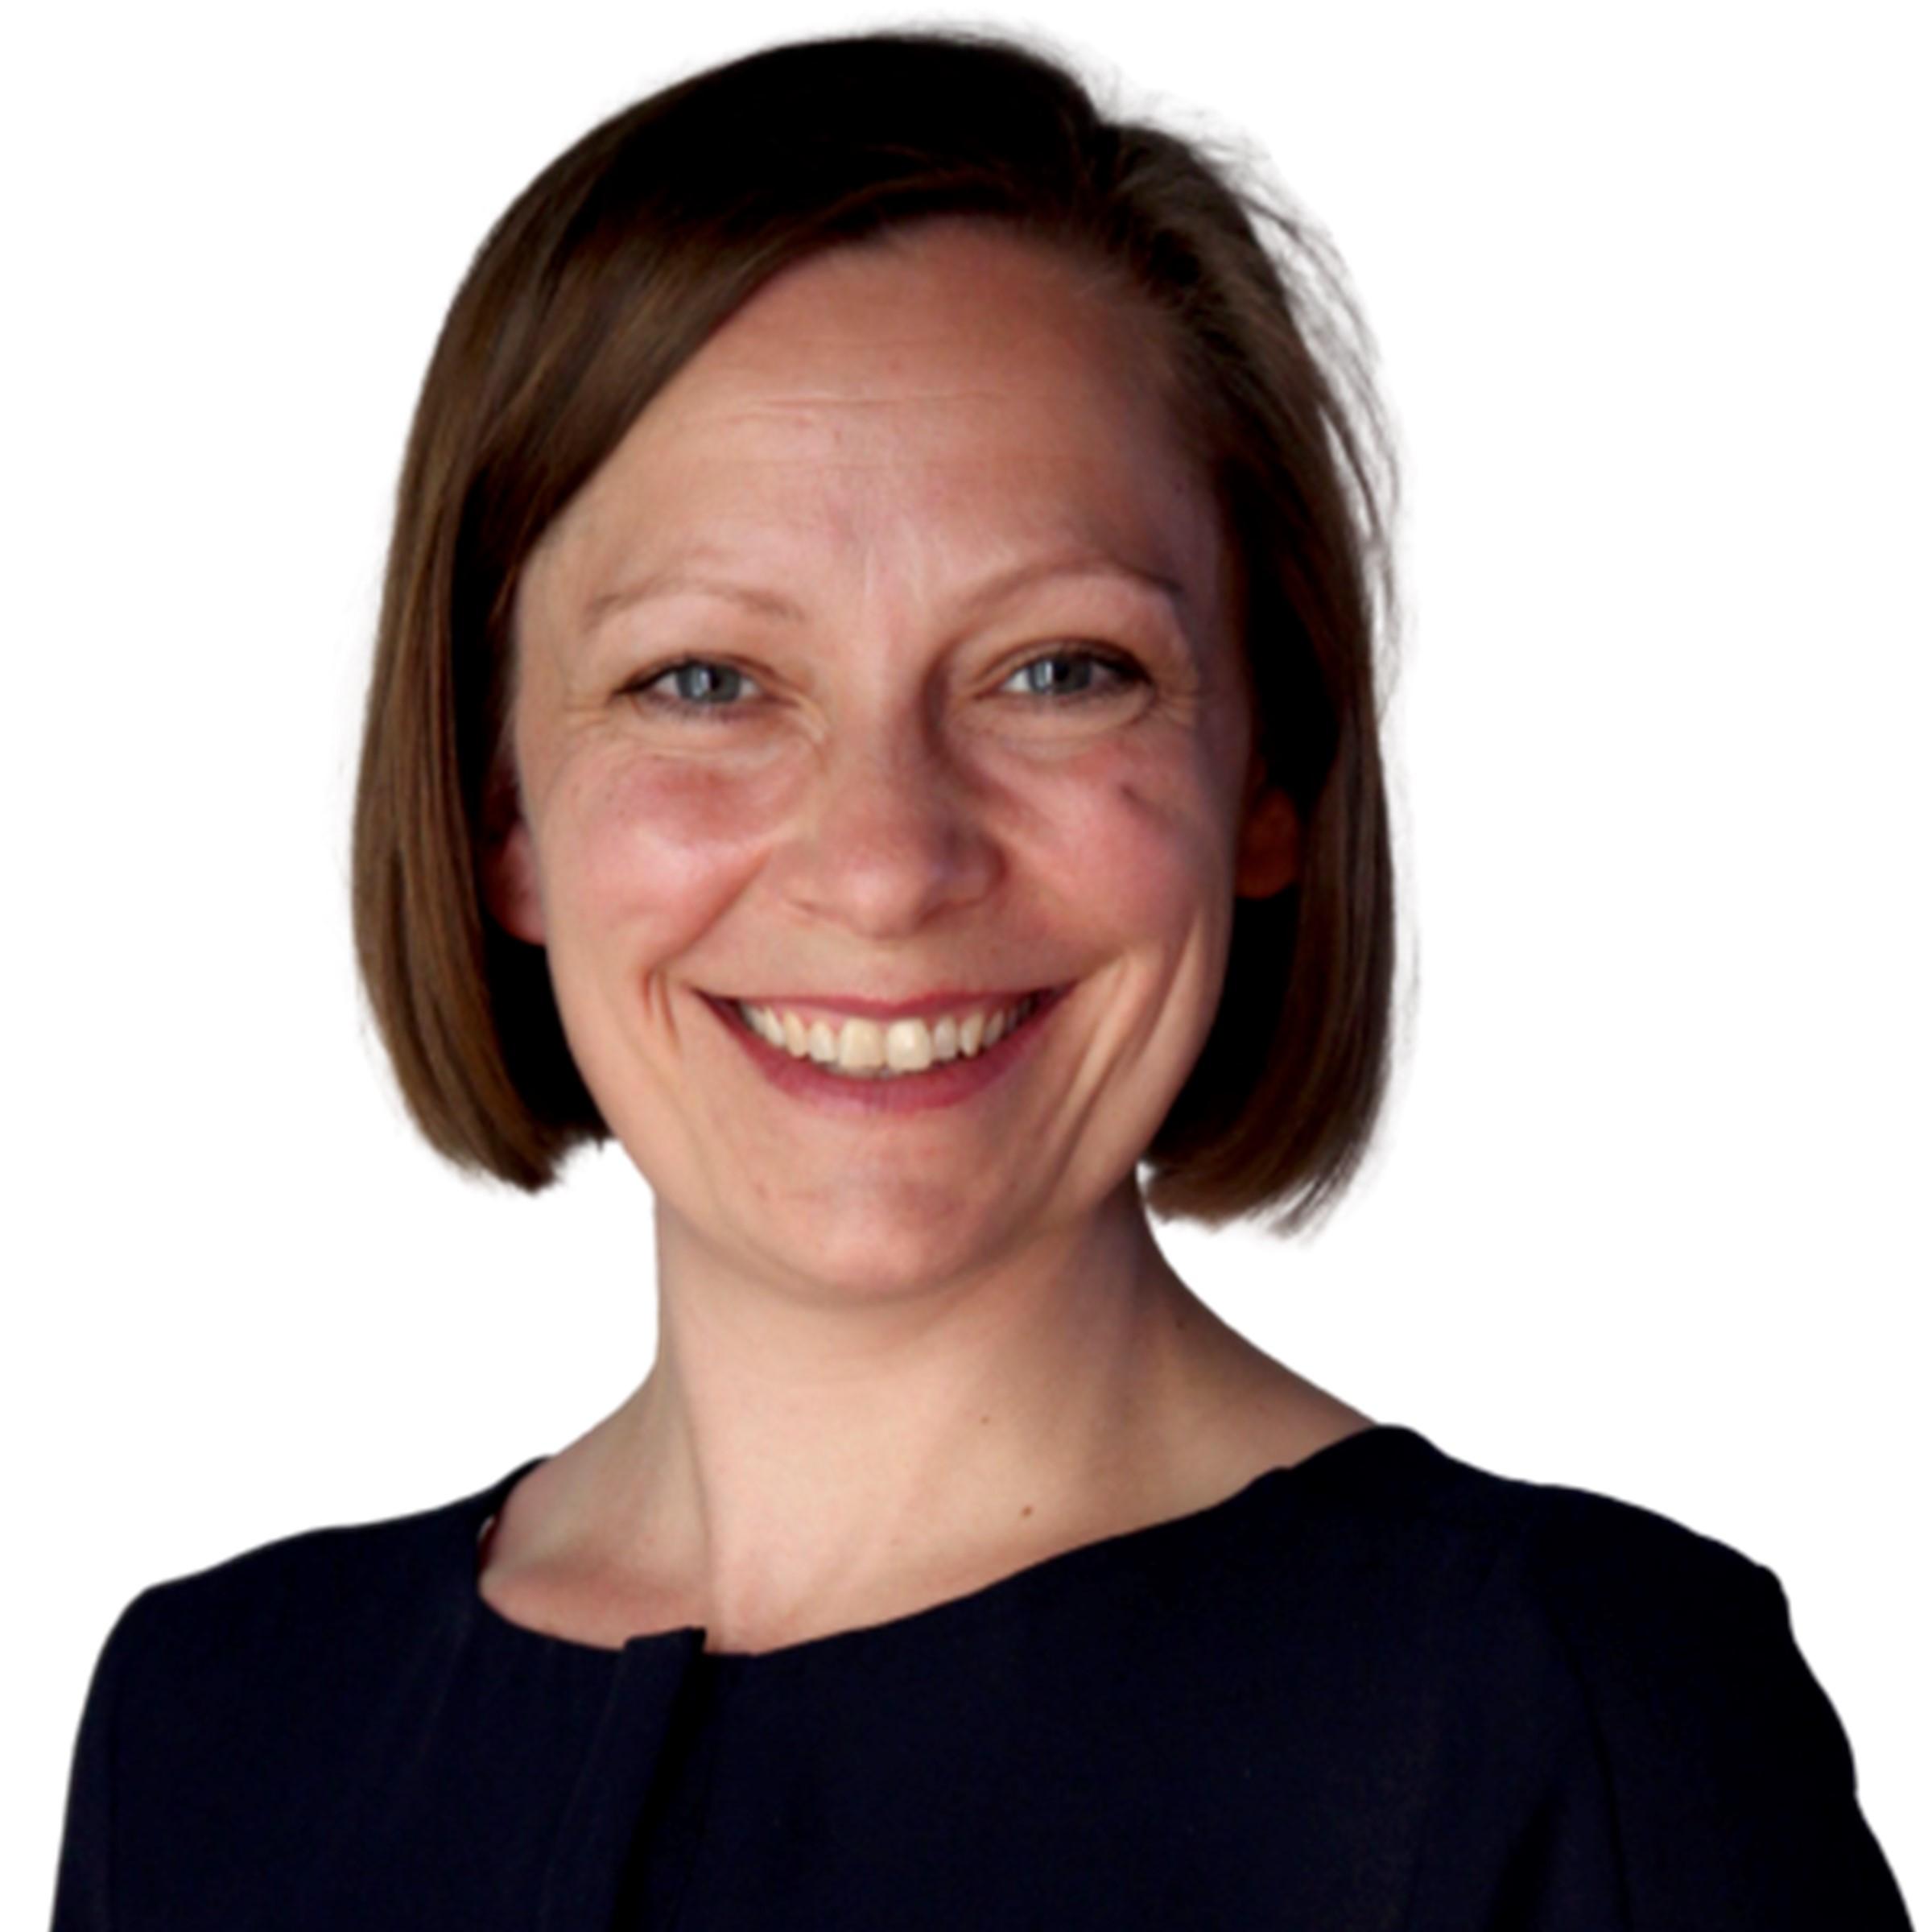 Liva Echwald-Tijsen